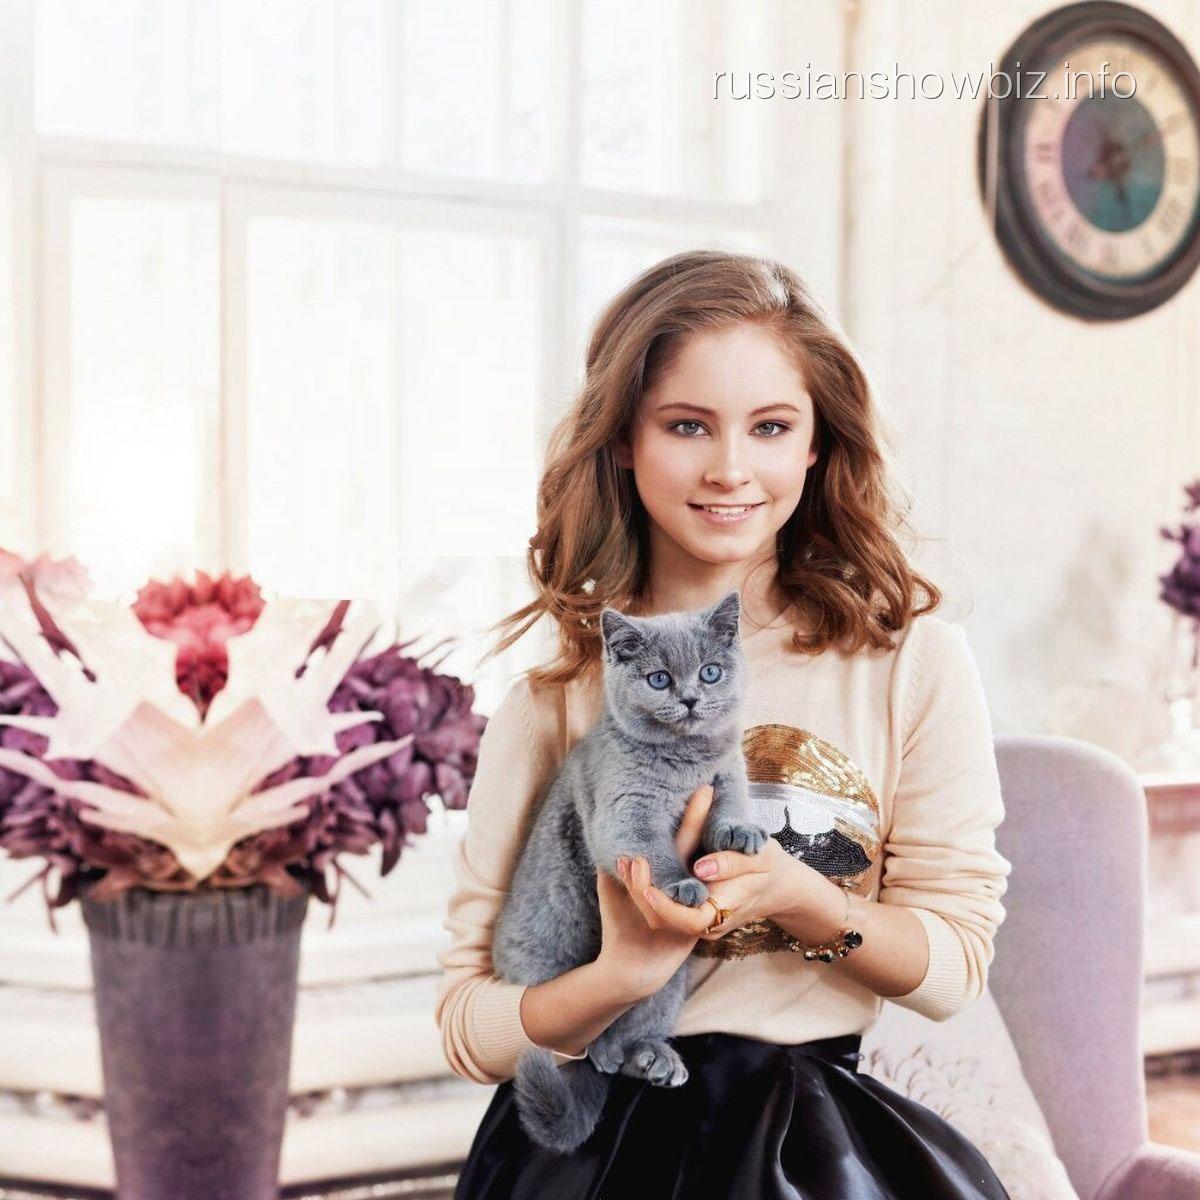 Юлия Липницкая (фото - Elle Girl)